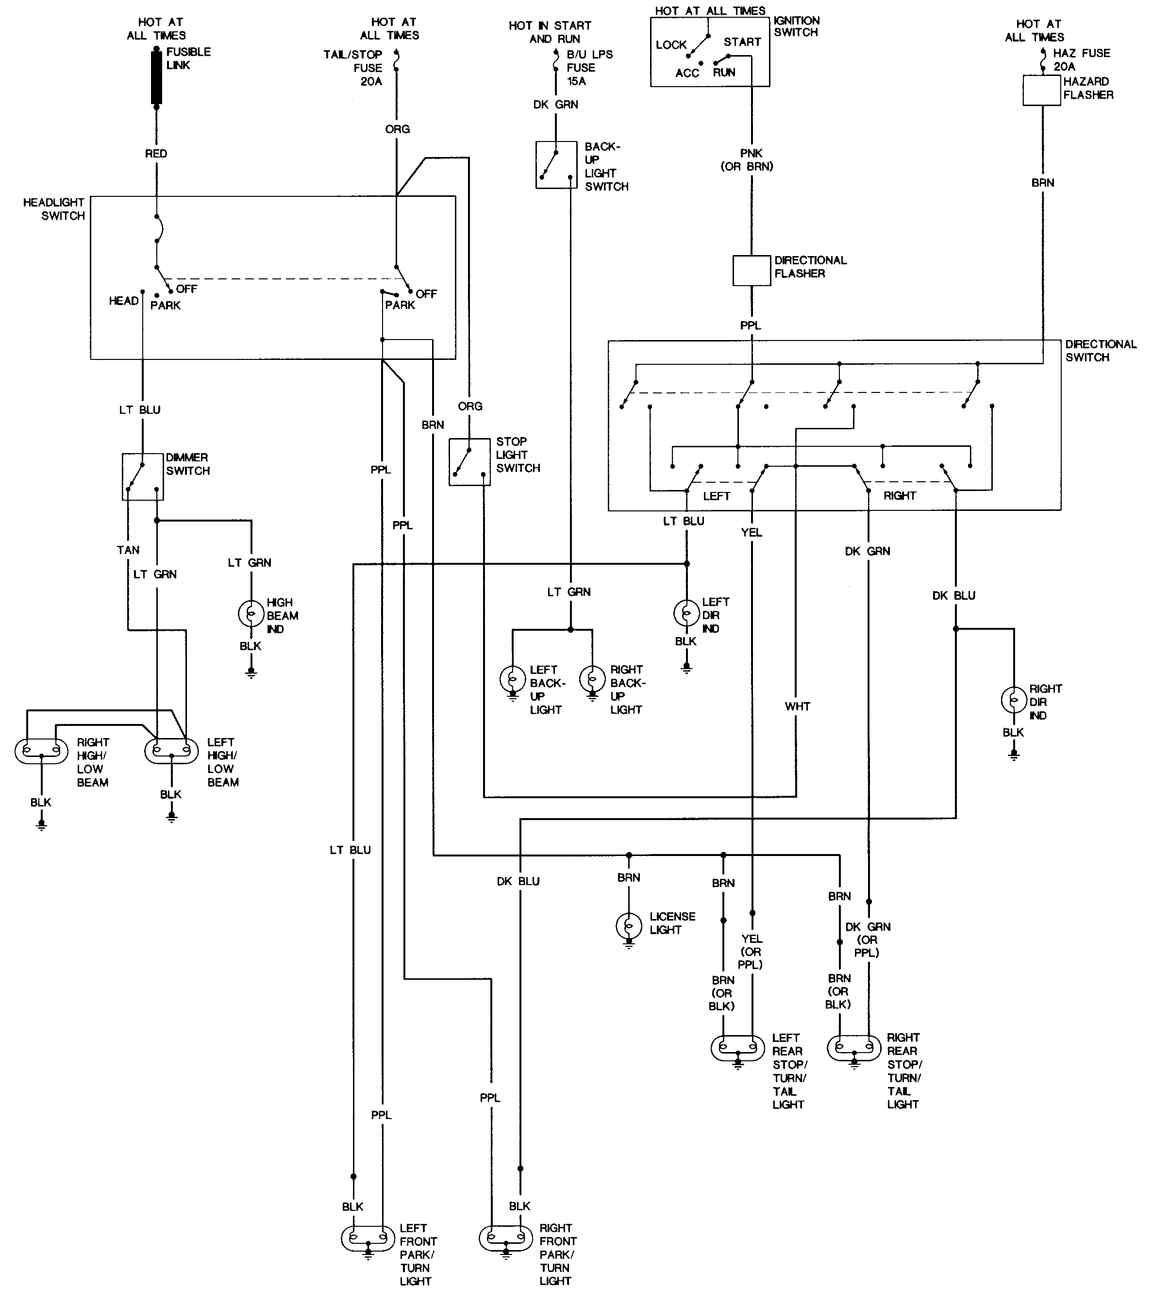 Chevy Sonic Wiring Diagram Tiffin Wiring Diagrams Bege Wiring Diagram